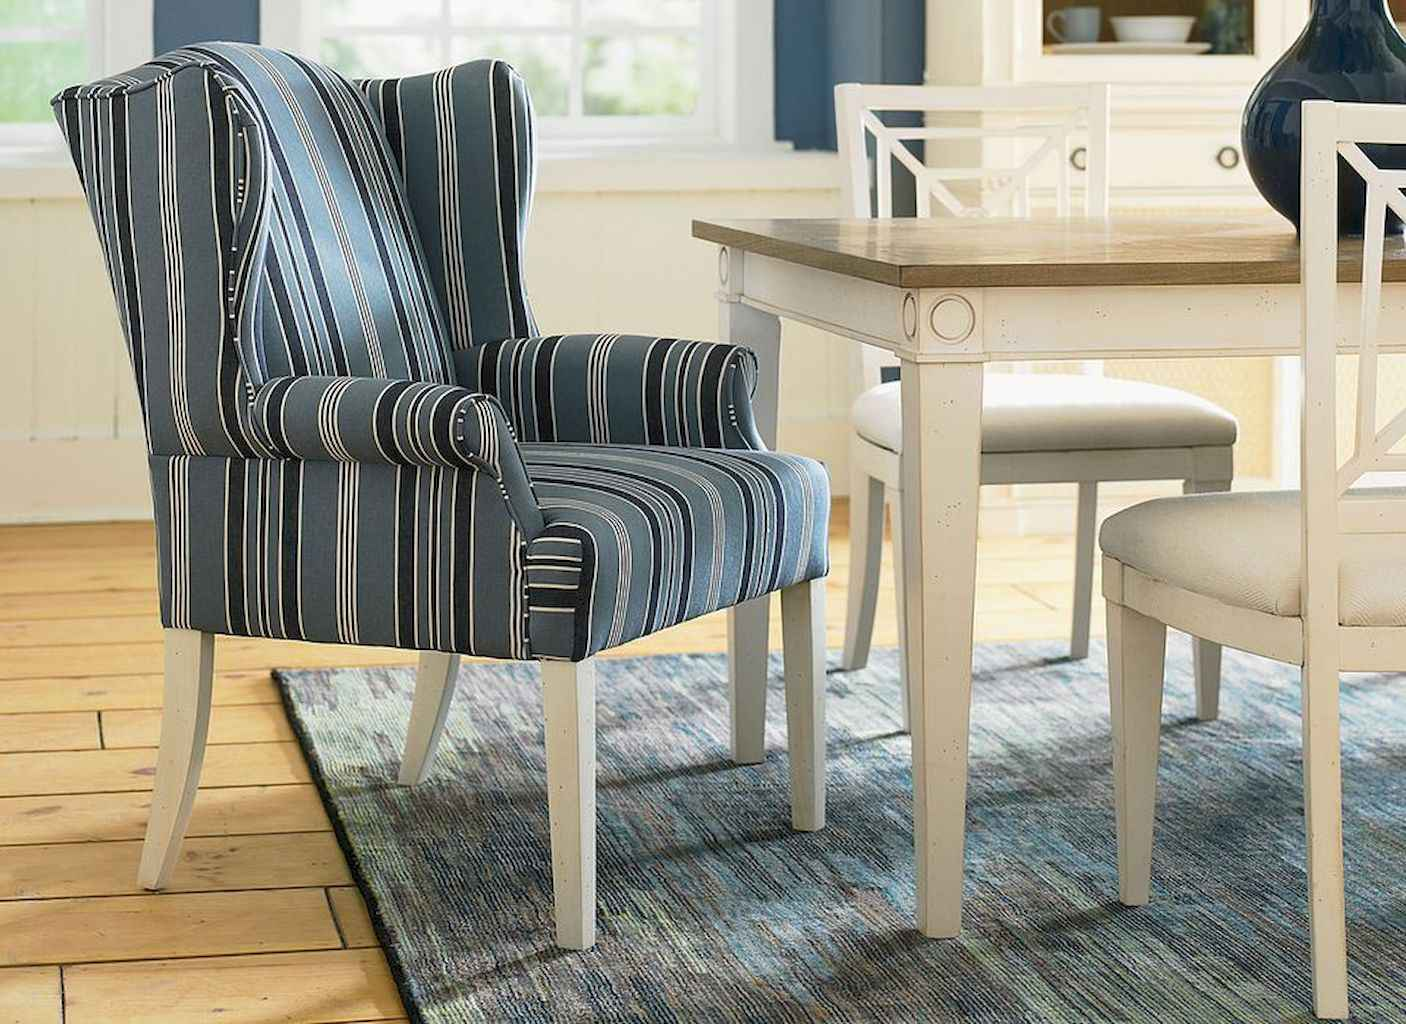 80 Elegant Harmony Interior Design Ideas For First Couple (9)